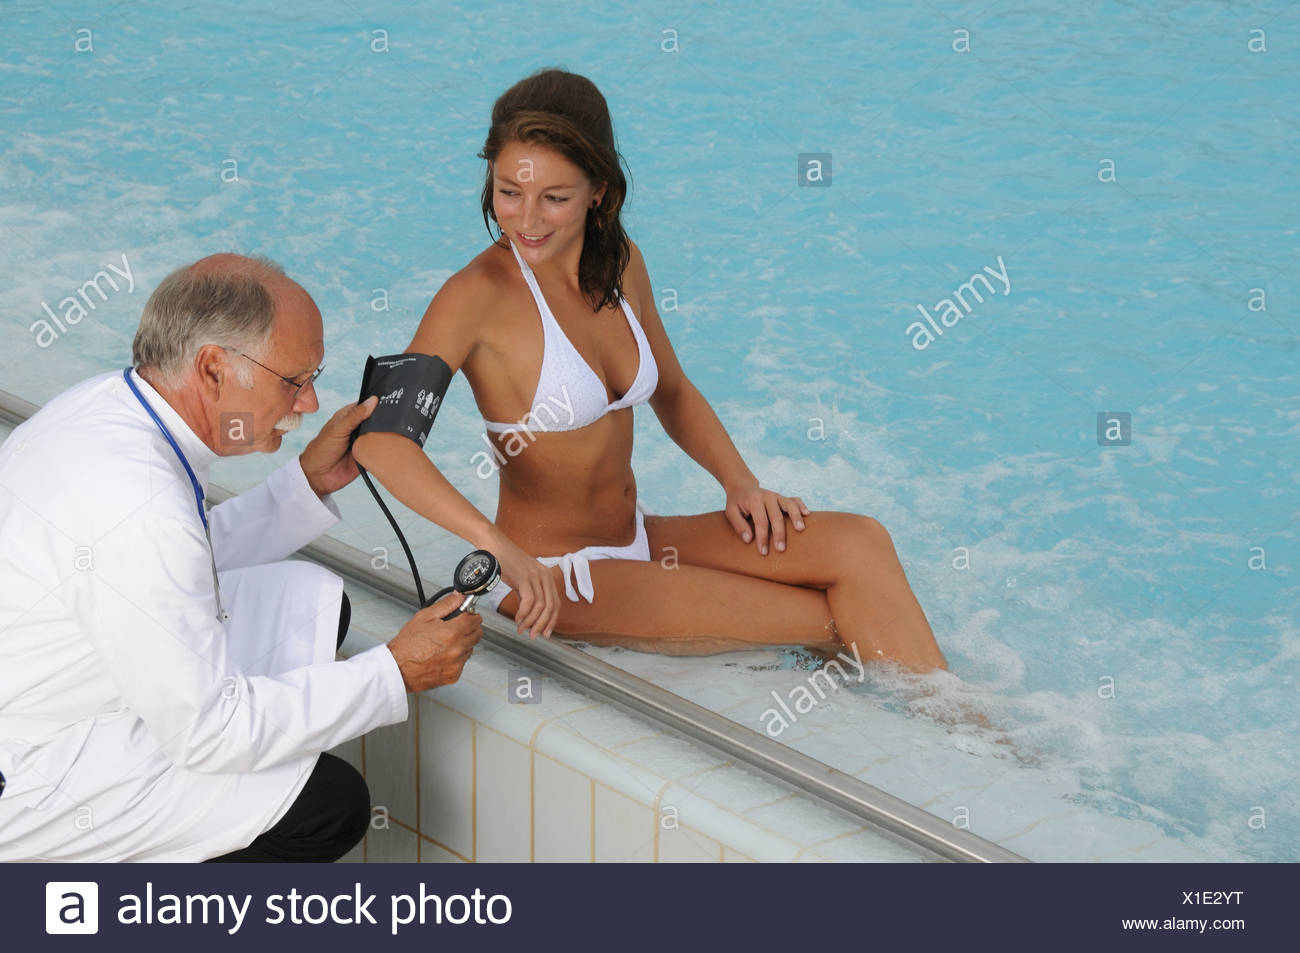 Wellness, bañera, médico, tratamiento, transformación, salud, belleza, investigación, mujer, piscina, piscina, presión arterial Imagen De Stock